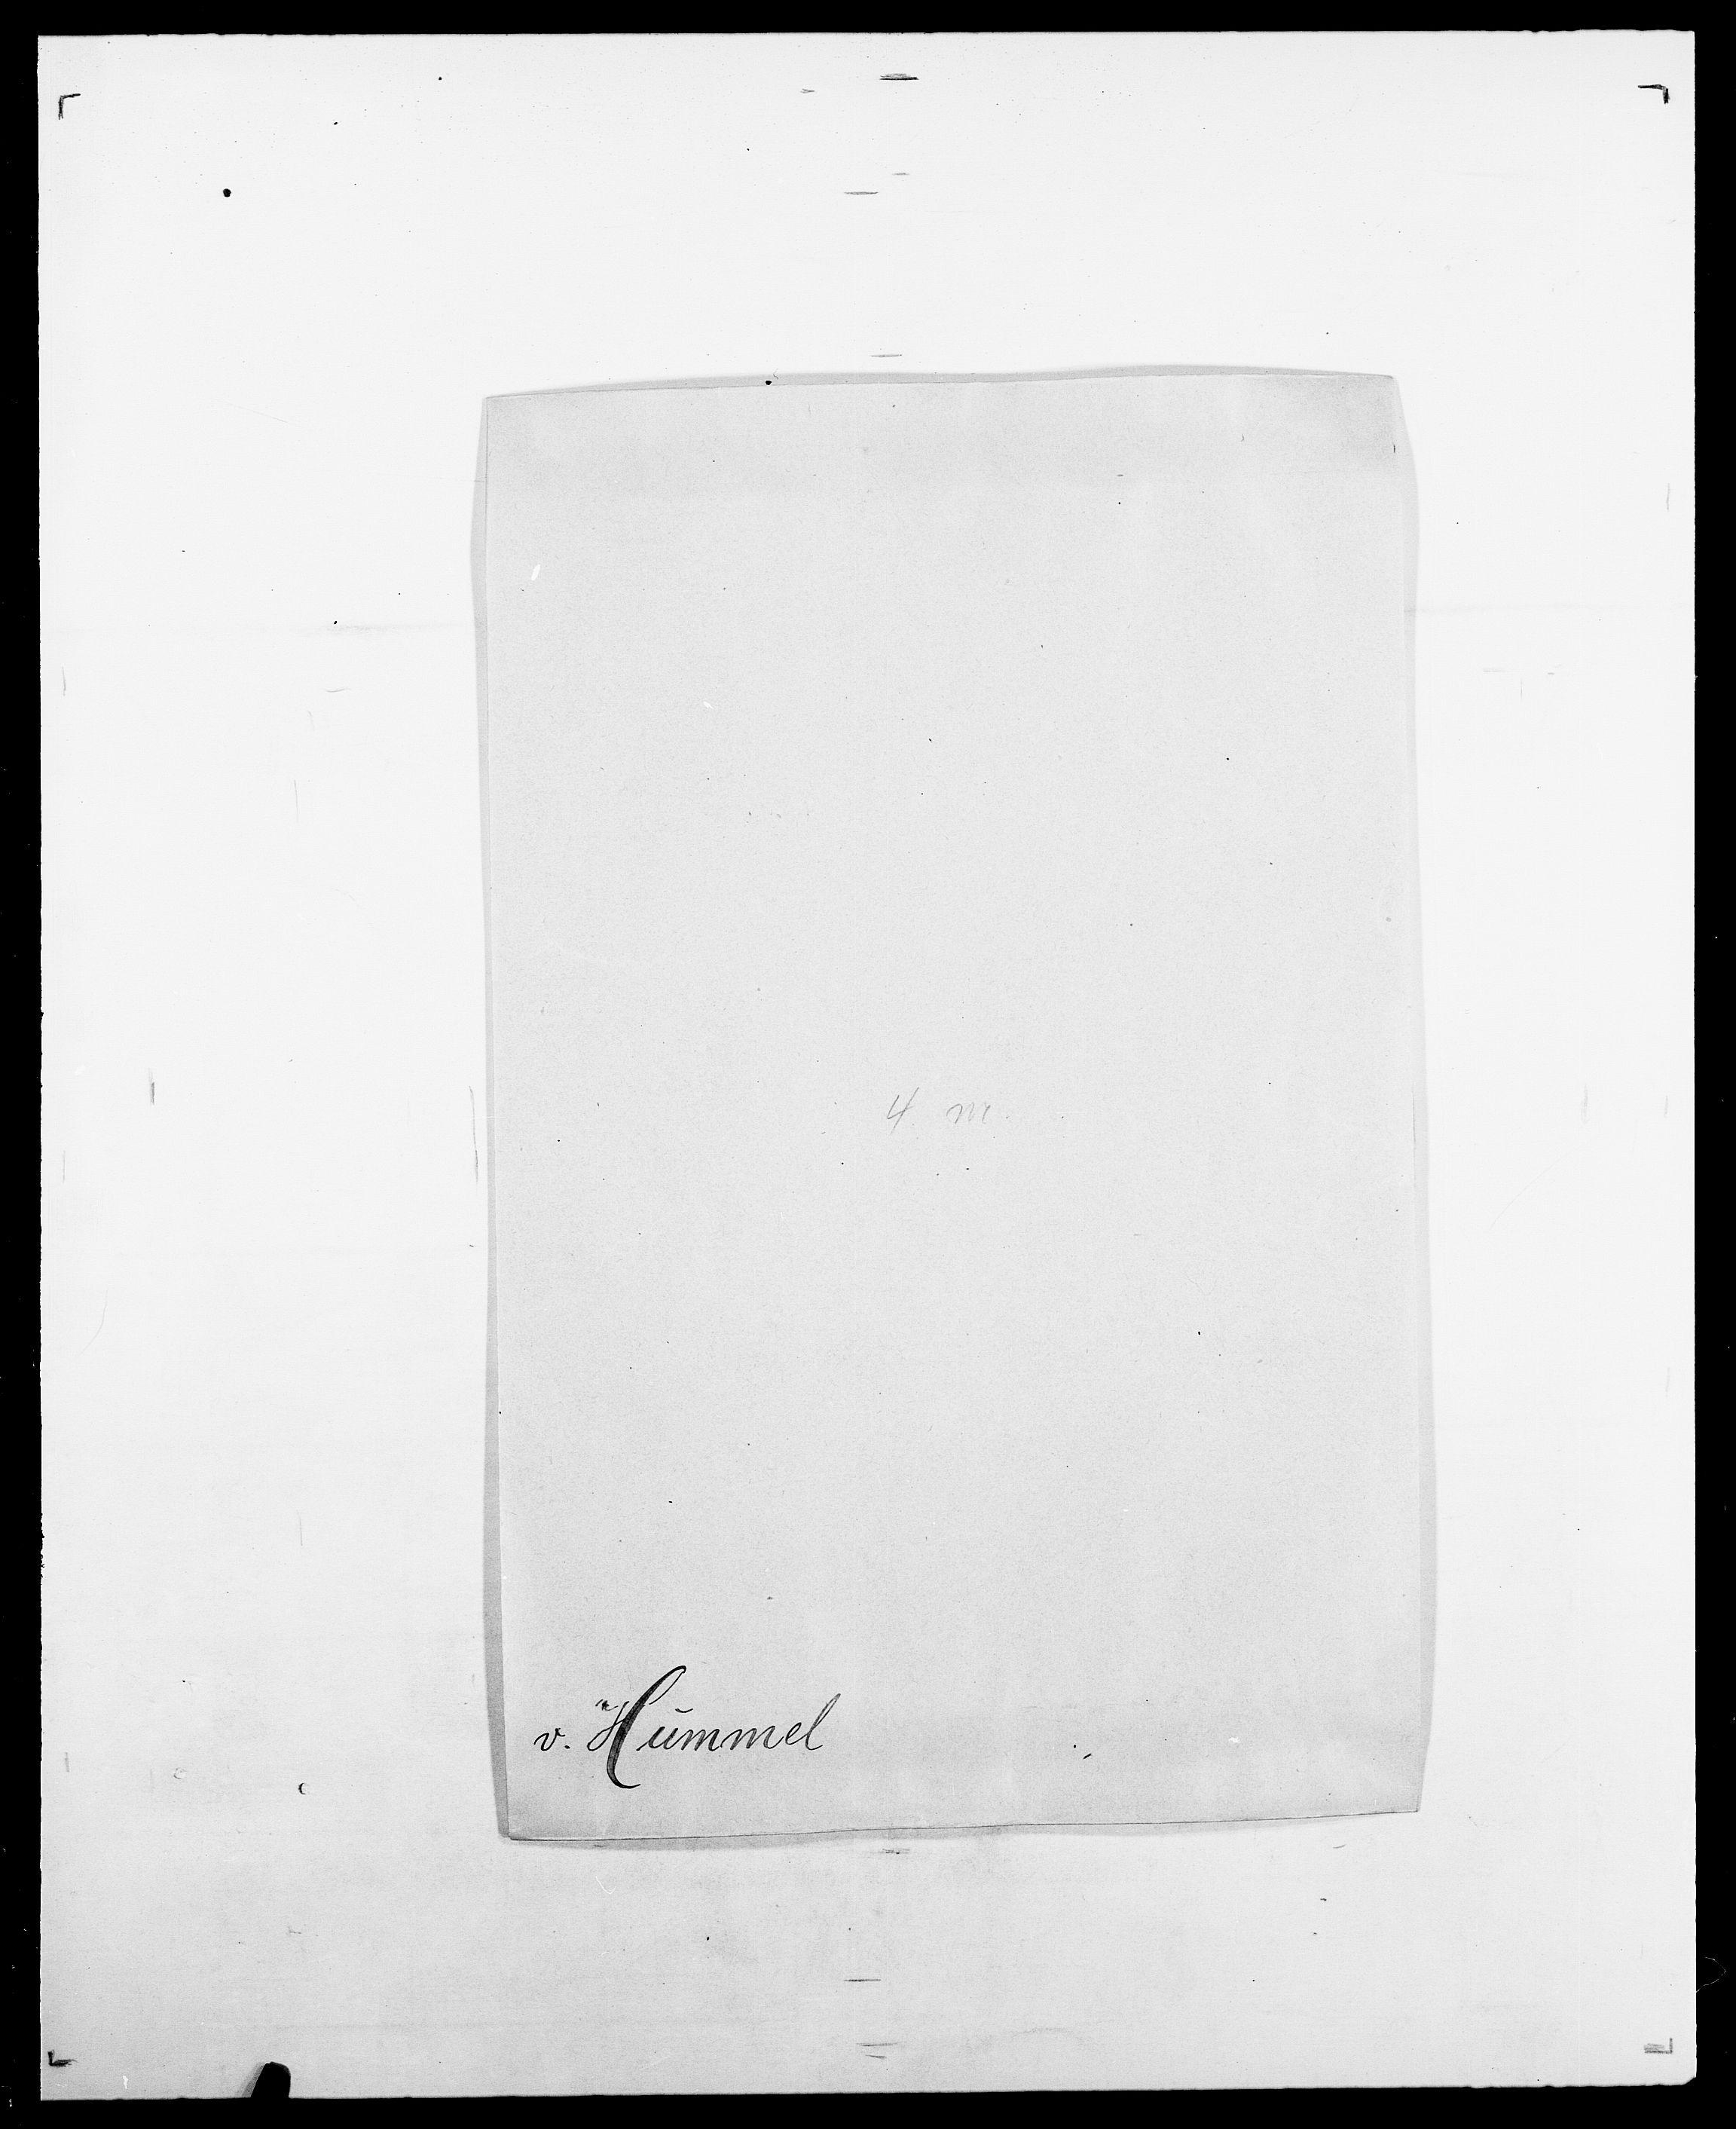 SAO, Delgobe, Charles Antoine - samling, D/Da/L0019: van der Hude - Joys, s. 54